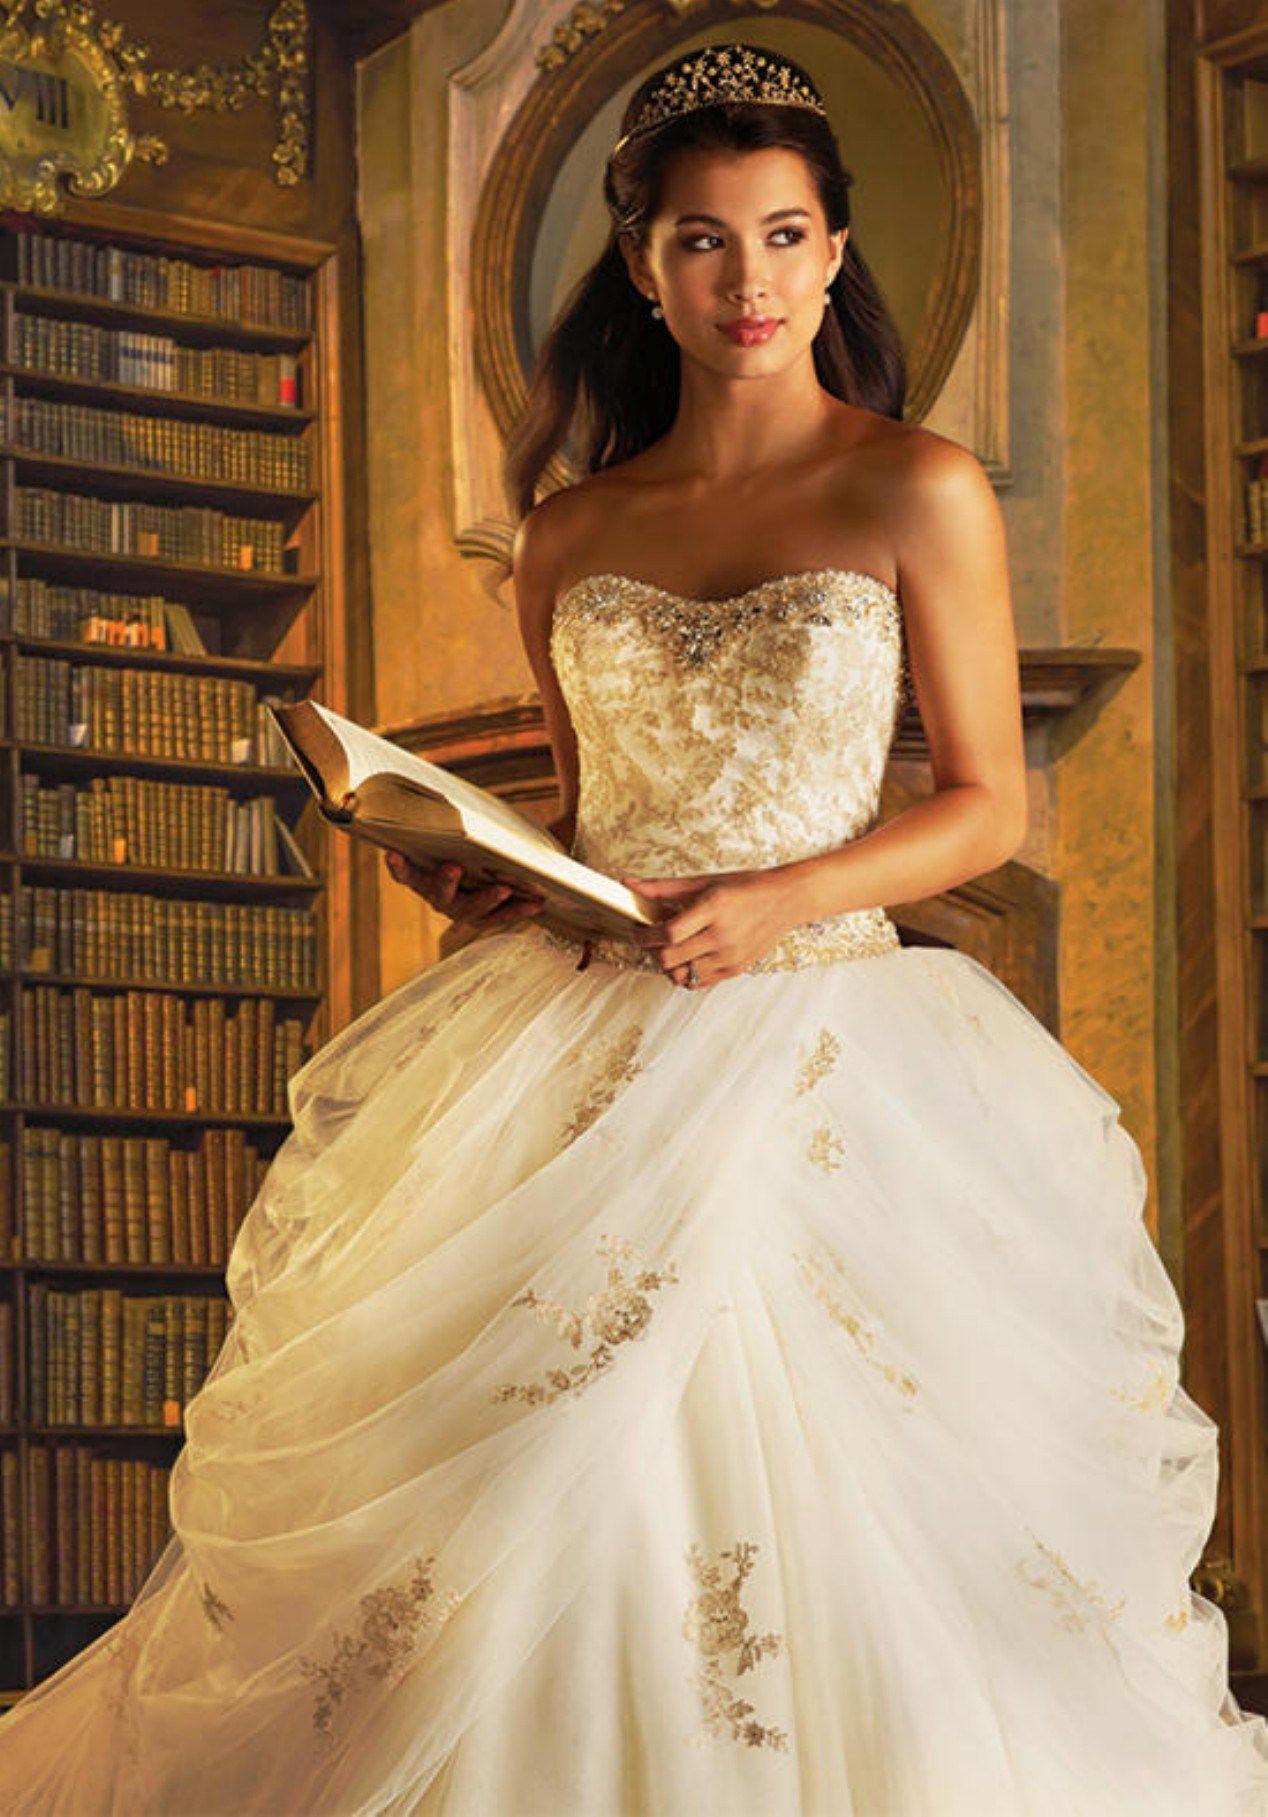 55 Breathtaking Disney Princess Wedding Dress To Fullfill Your Wedding Fantasy Vis Wed Disney Princess Wedding Dresses Disney Wedding Dresses Belle Wedding Dresses [ 1817 x 1268 Pixel ]